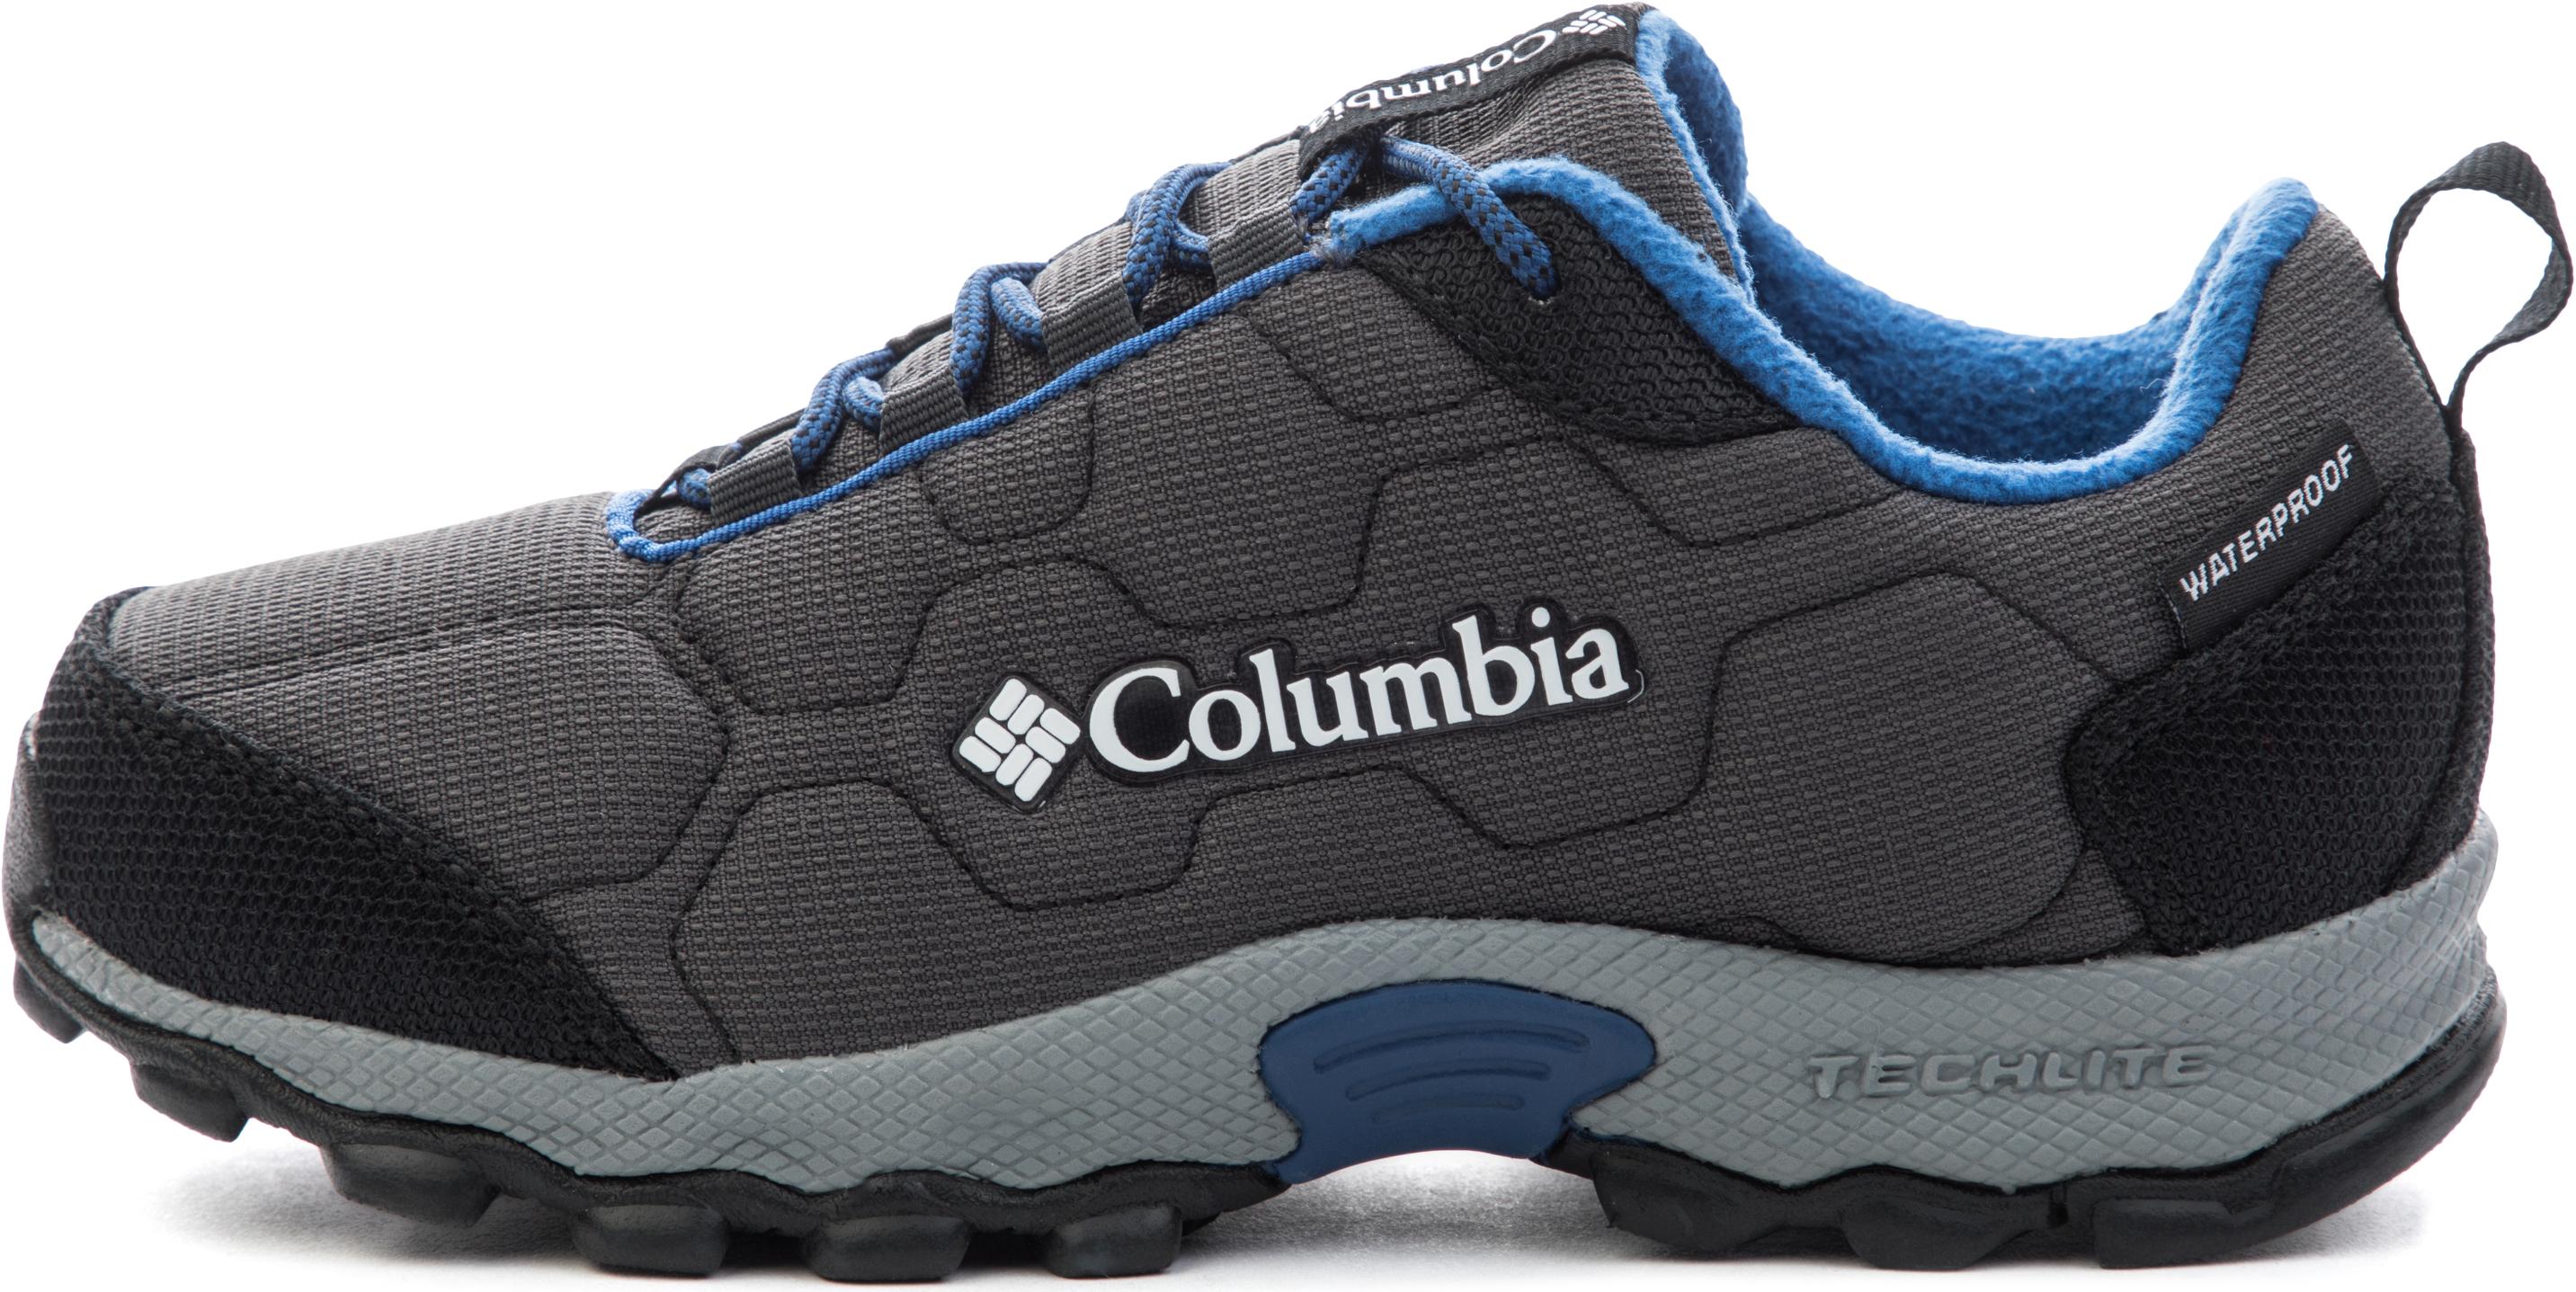 Columbia Ботинки утепленные для мальчиков Columbia Youth Firecamp Sledder 3, размер 39 цена